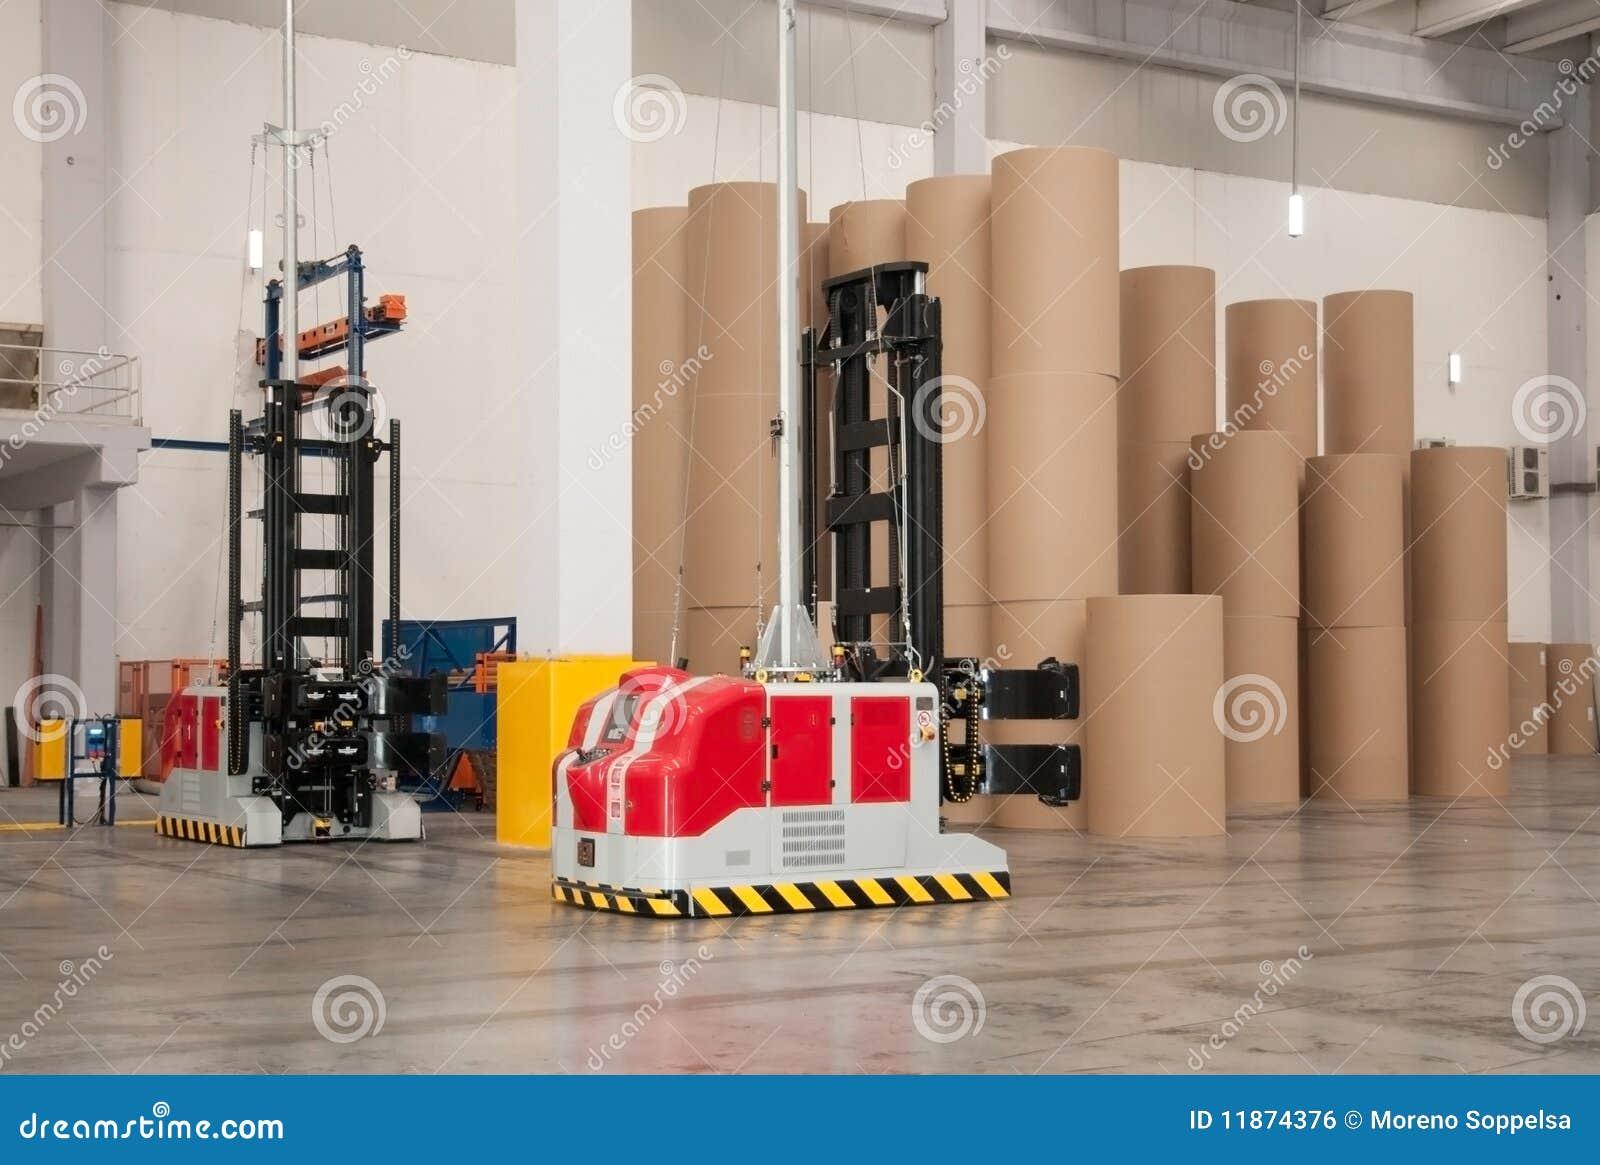 term paper warehouse reviews